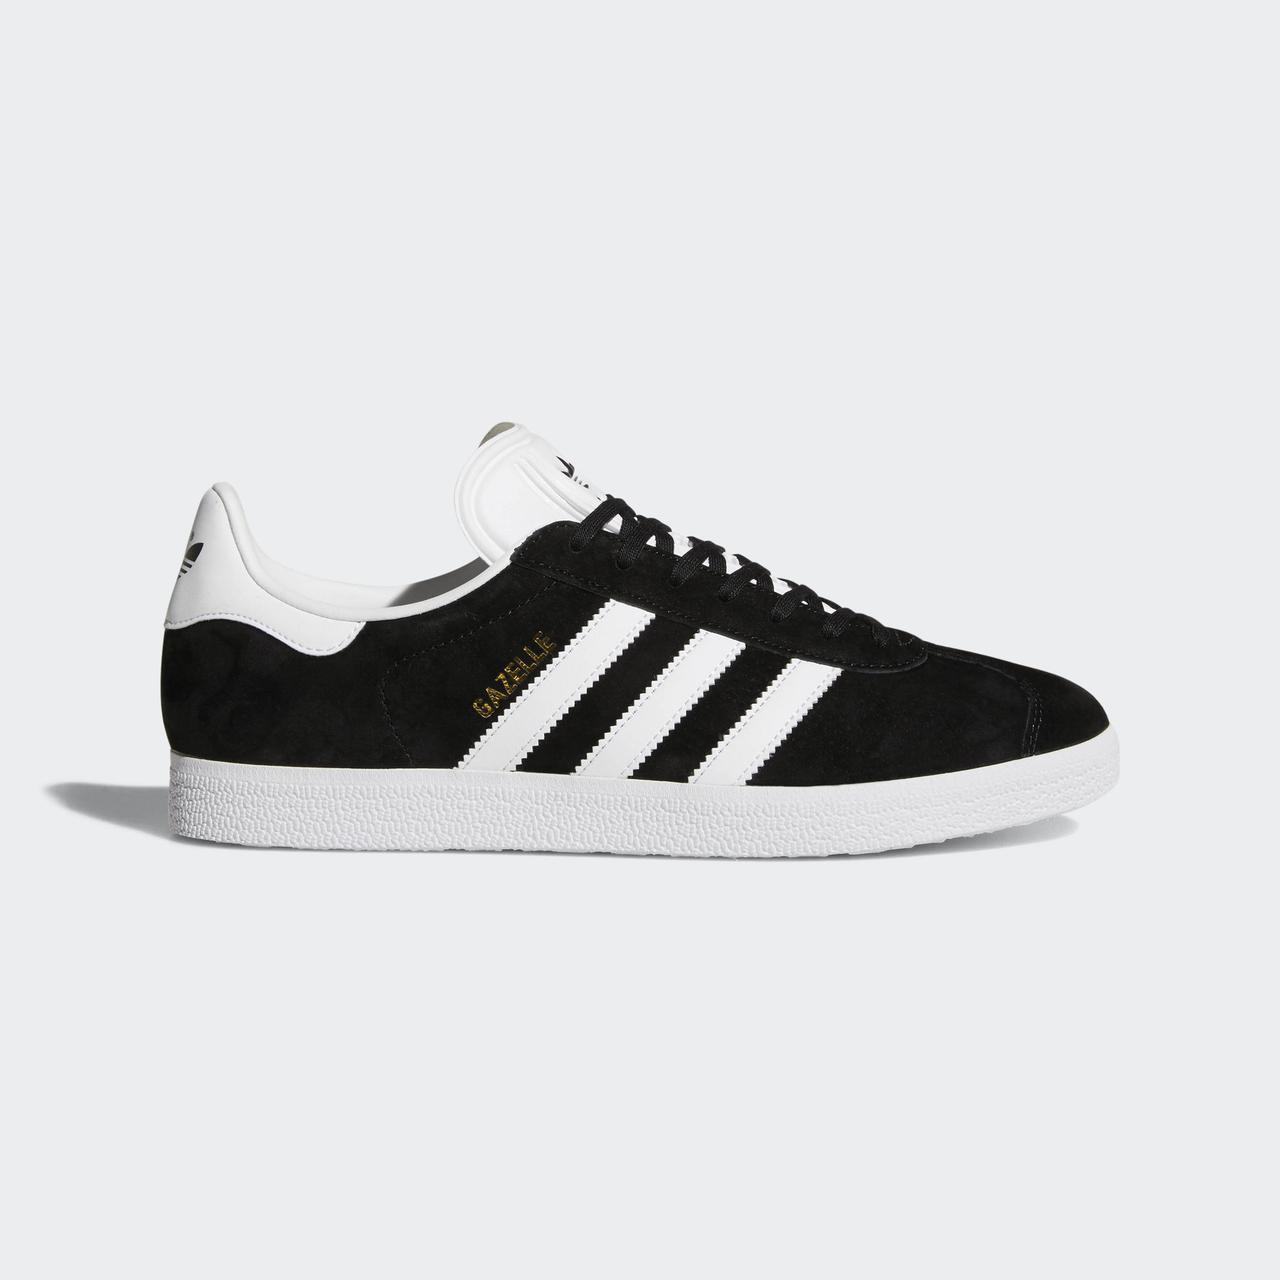 Мужские кроссовки Adidas Superstar Gazelle Black White Черно-Белые - BBZ  Shoes   Wear 2280d4c9a4c84